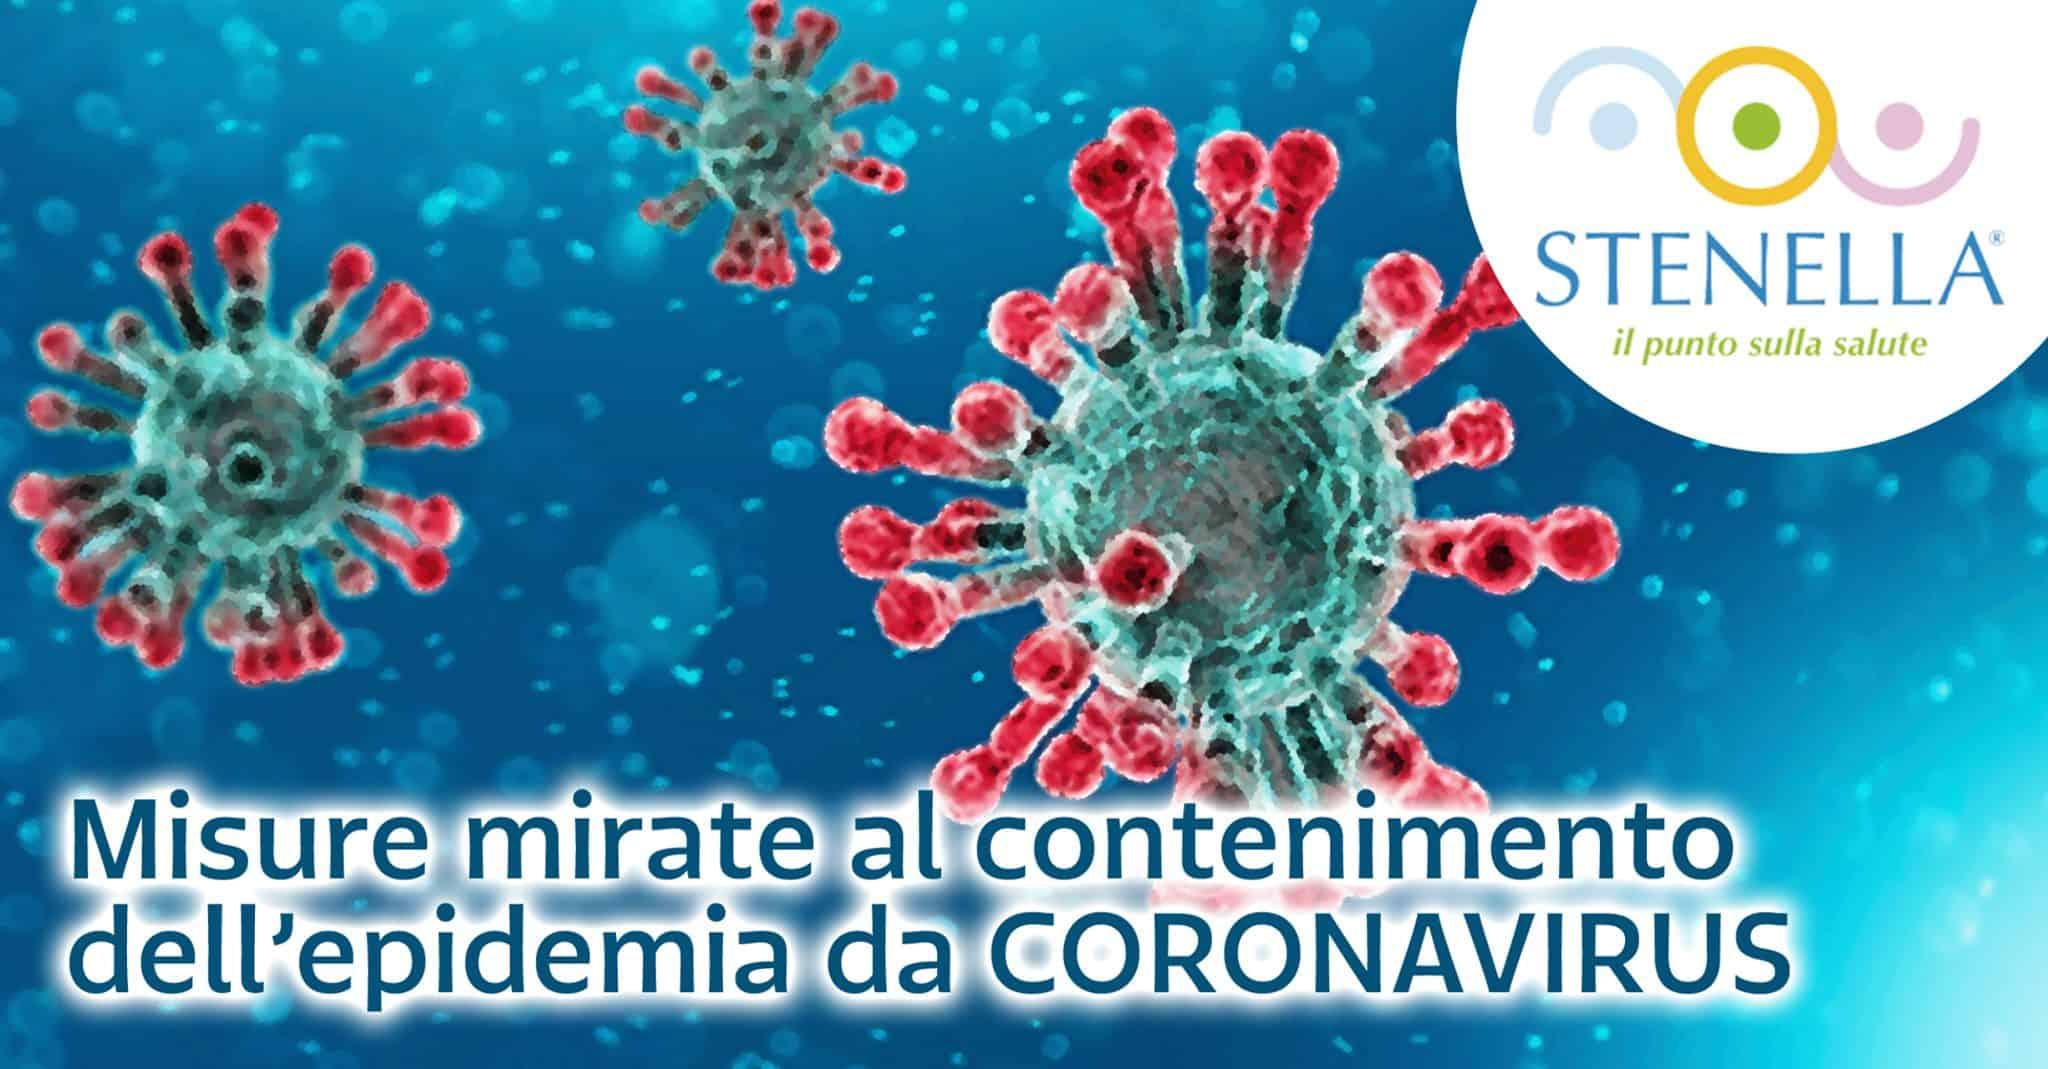 contenimento coronavirus